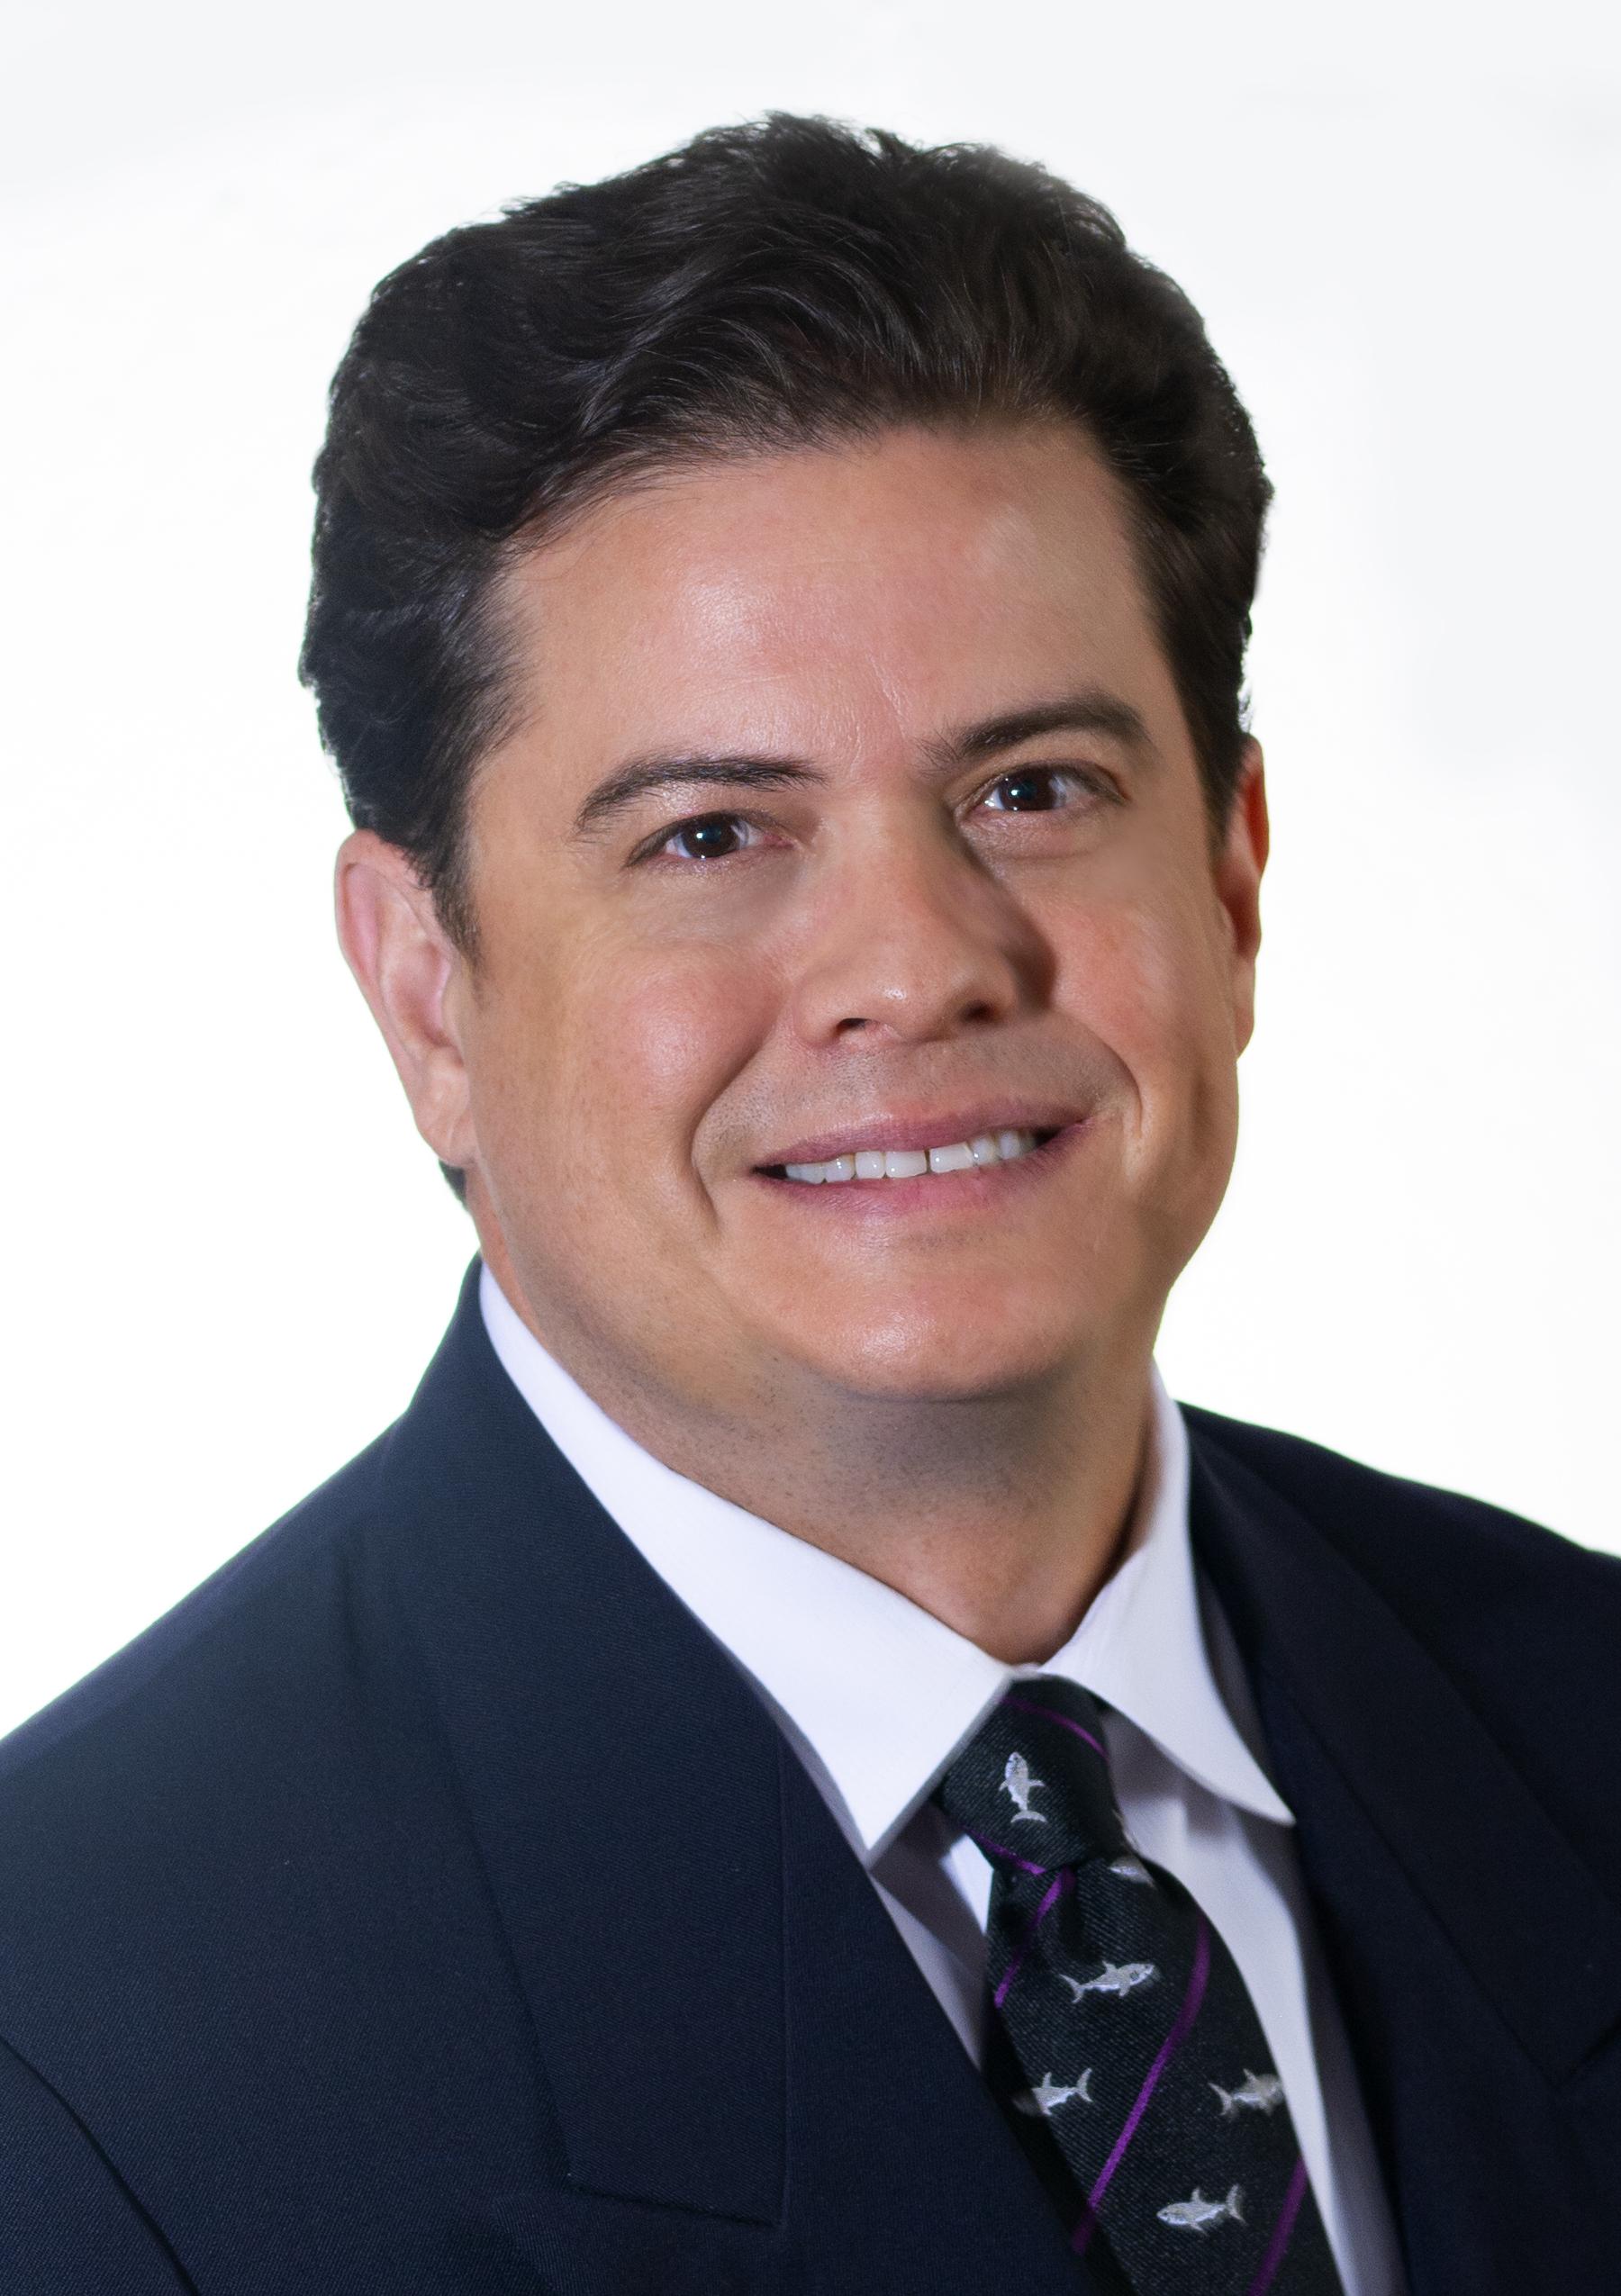 Austin Texas Personal Injury Lawyer Alex R. Hernandez Jr.